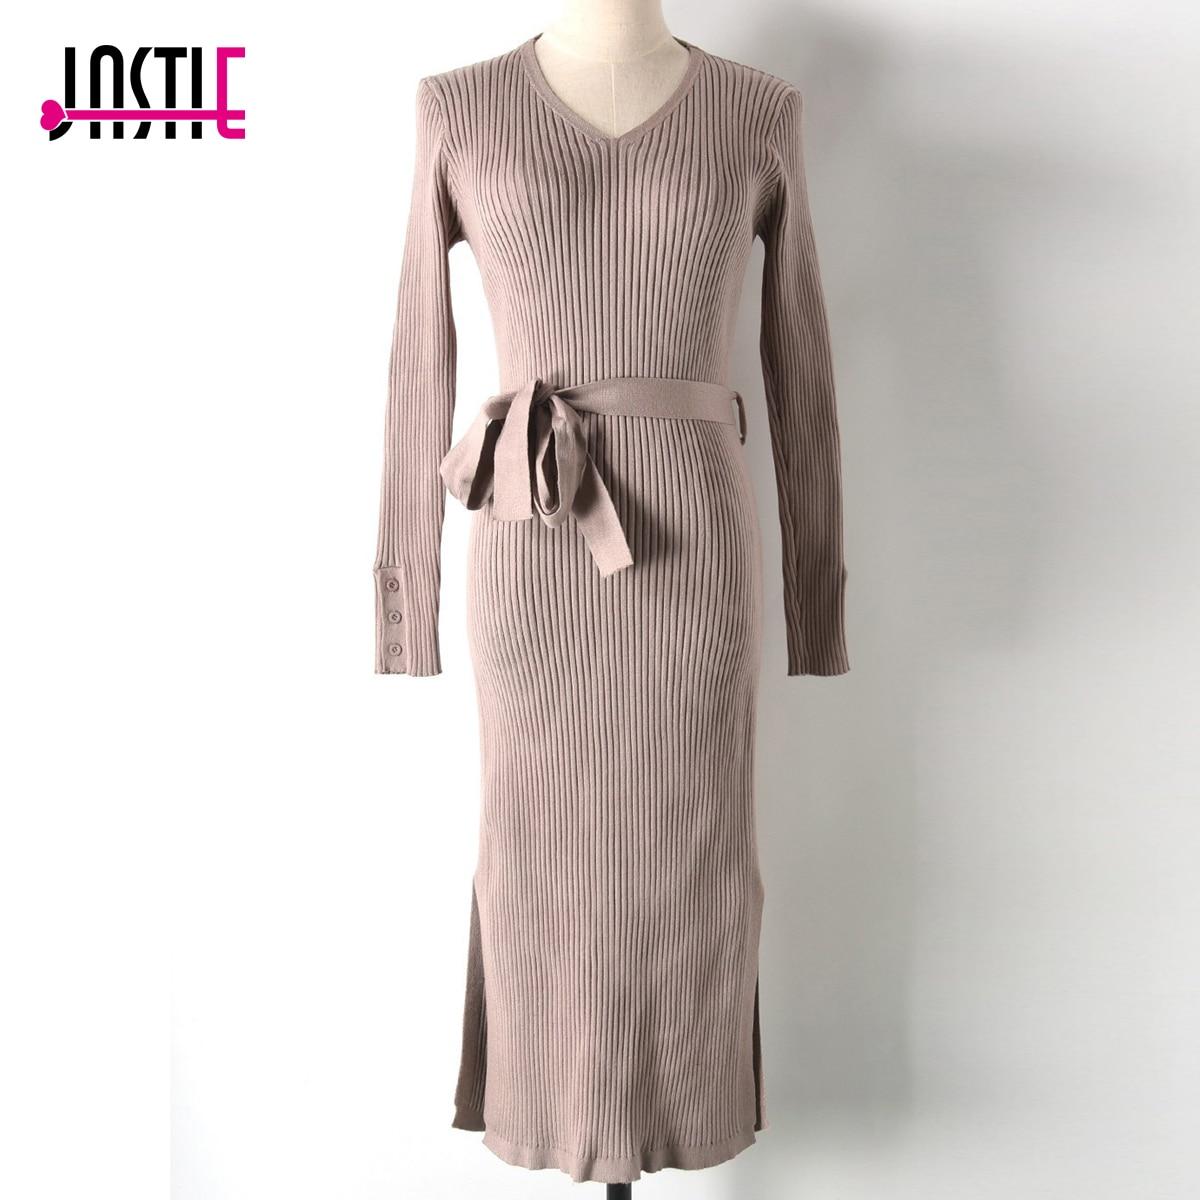 Jastie V-Neck Long Knitted Sweater Dress Solid Color Slim Bodycon Dress Long Sleeve High Slit Ribbed Midi Dresses Women Vestidos long sleeve slit knit midi dress with sleeves